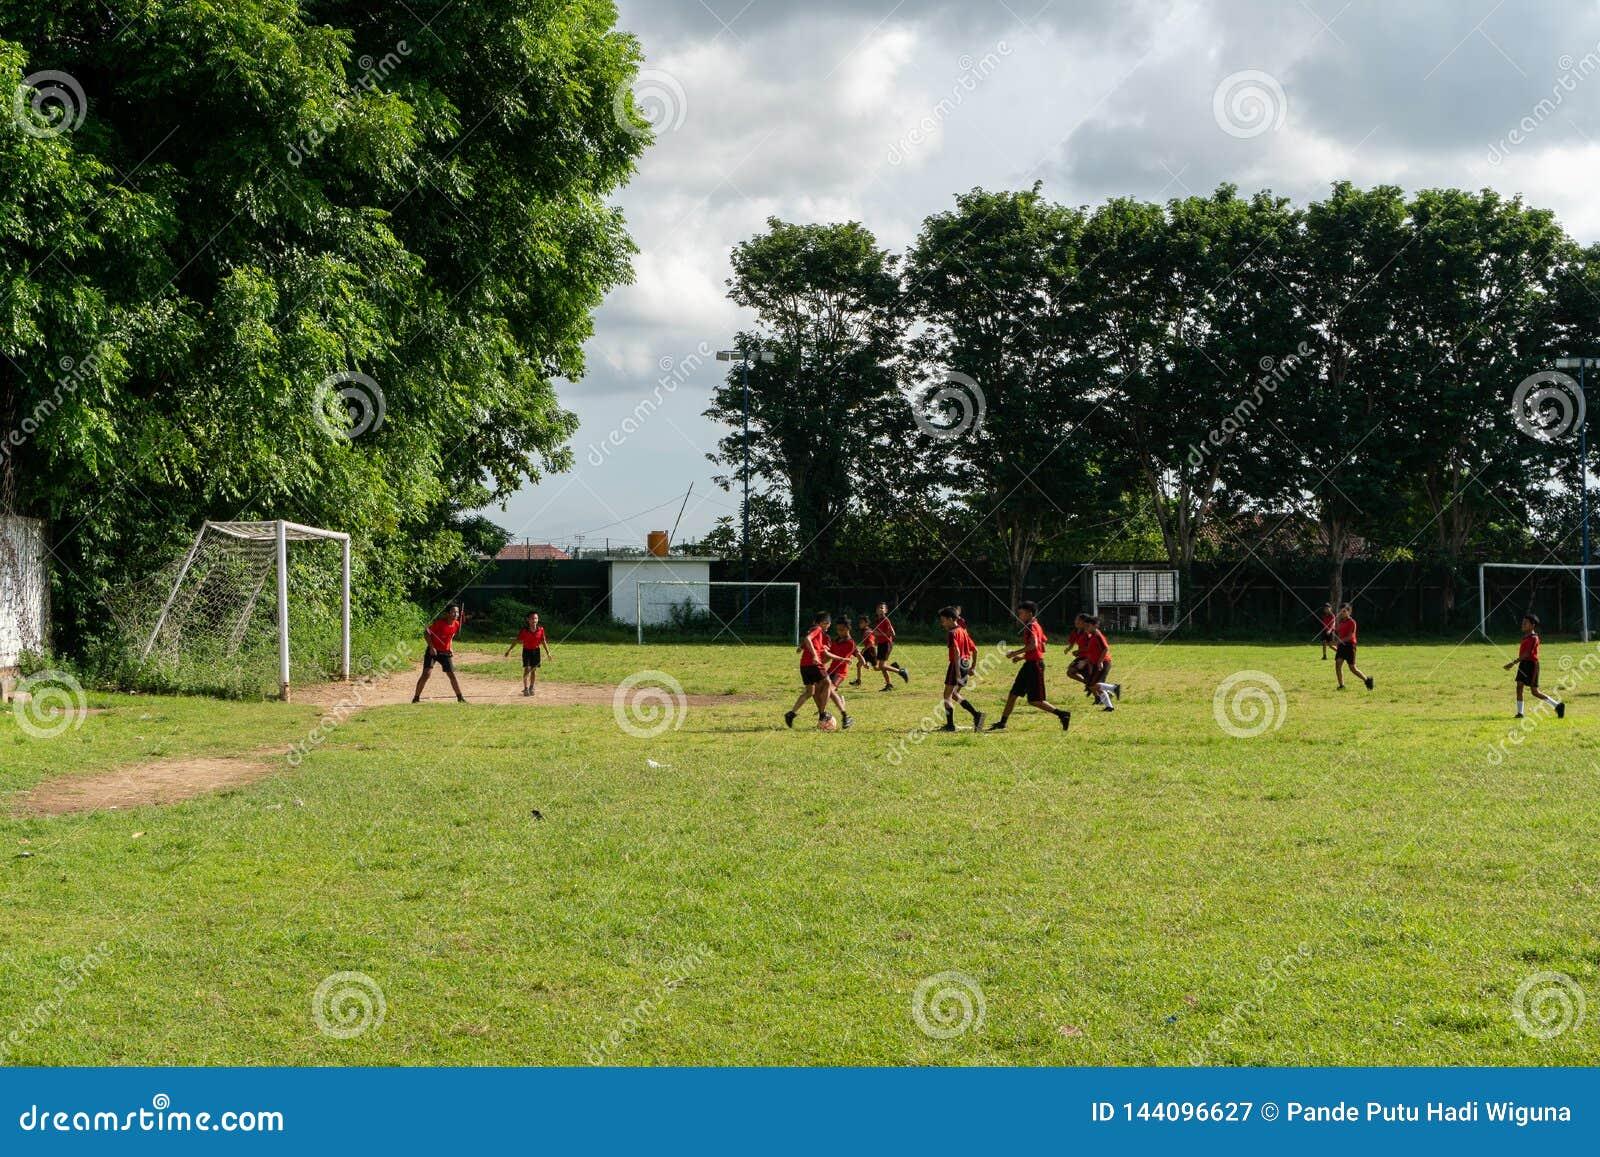 BADUNG, BALI/INDONESIA- 5. APRIL 2019: Grundlegender Studentenspielfußball oder -fußball auf dem Feld mit rotem Trikot